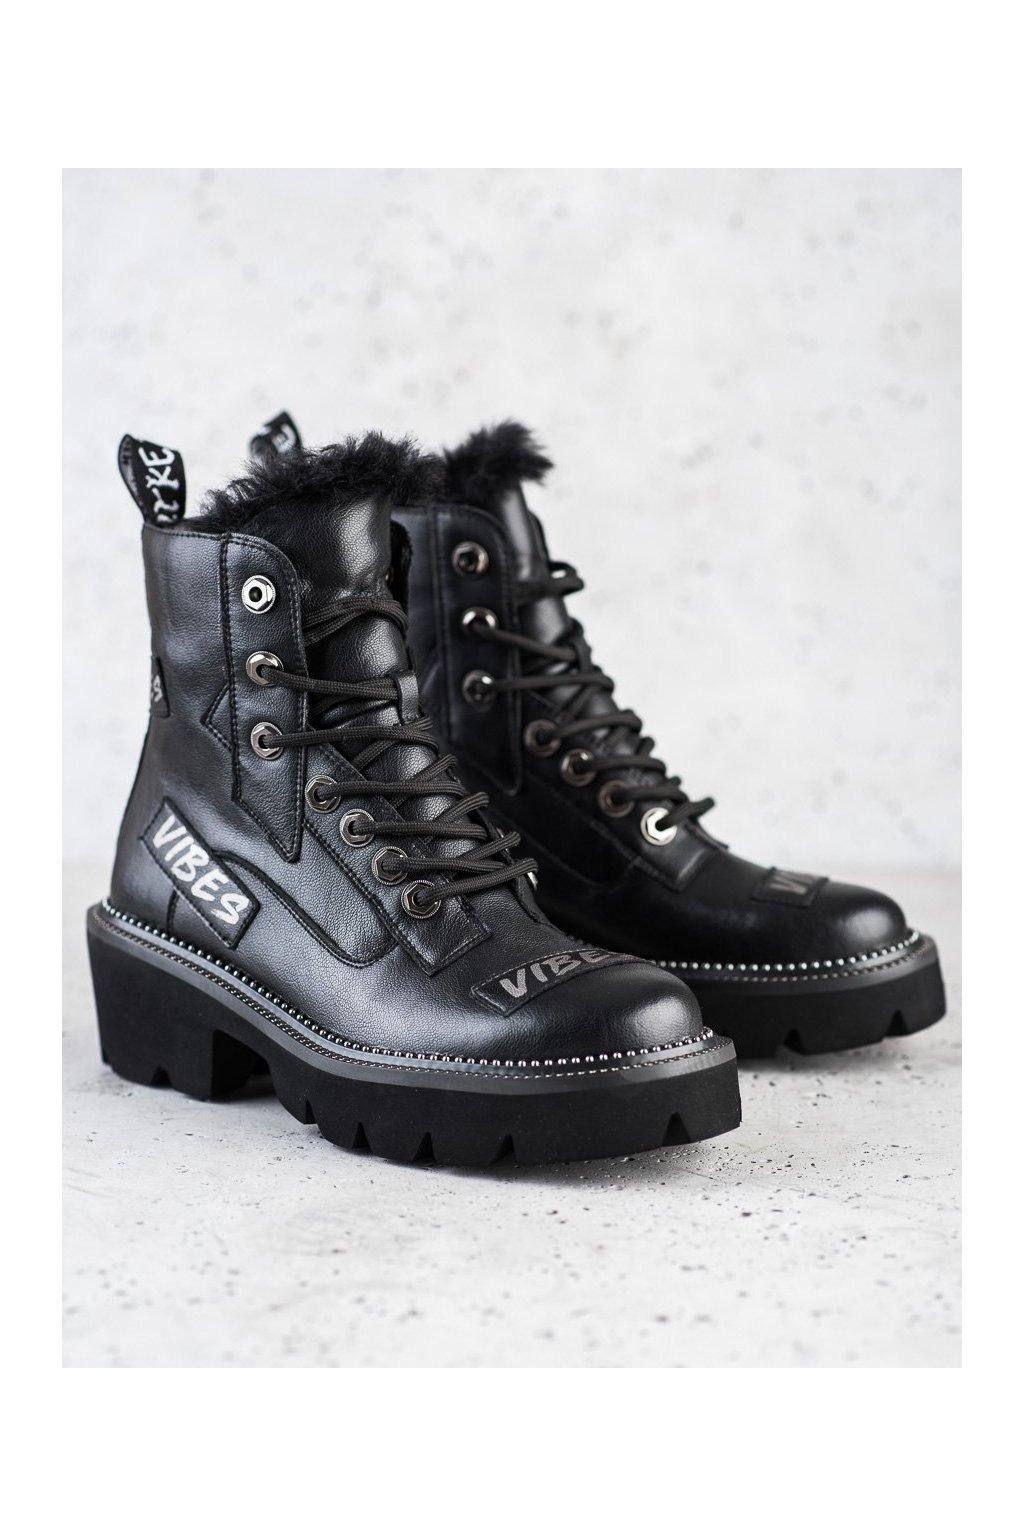 Čierne dámske topánky Artiker kod 47C158B